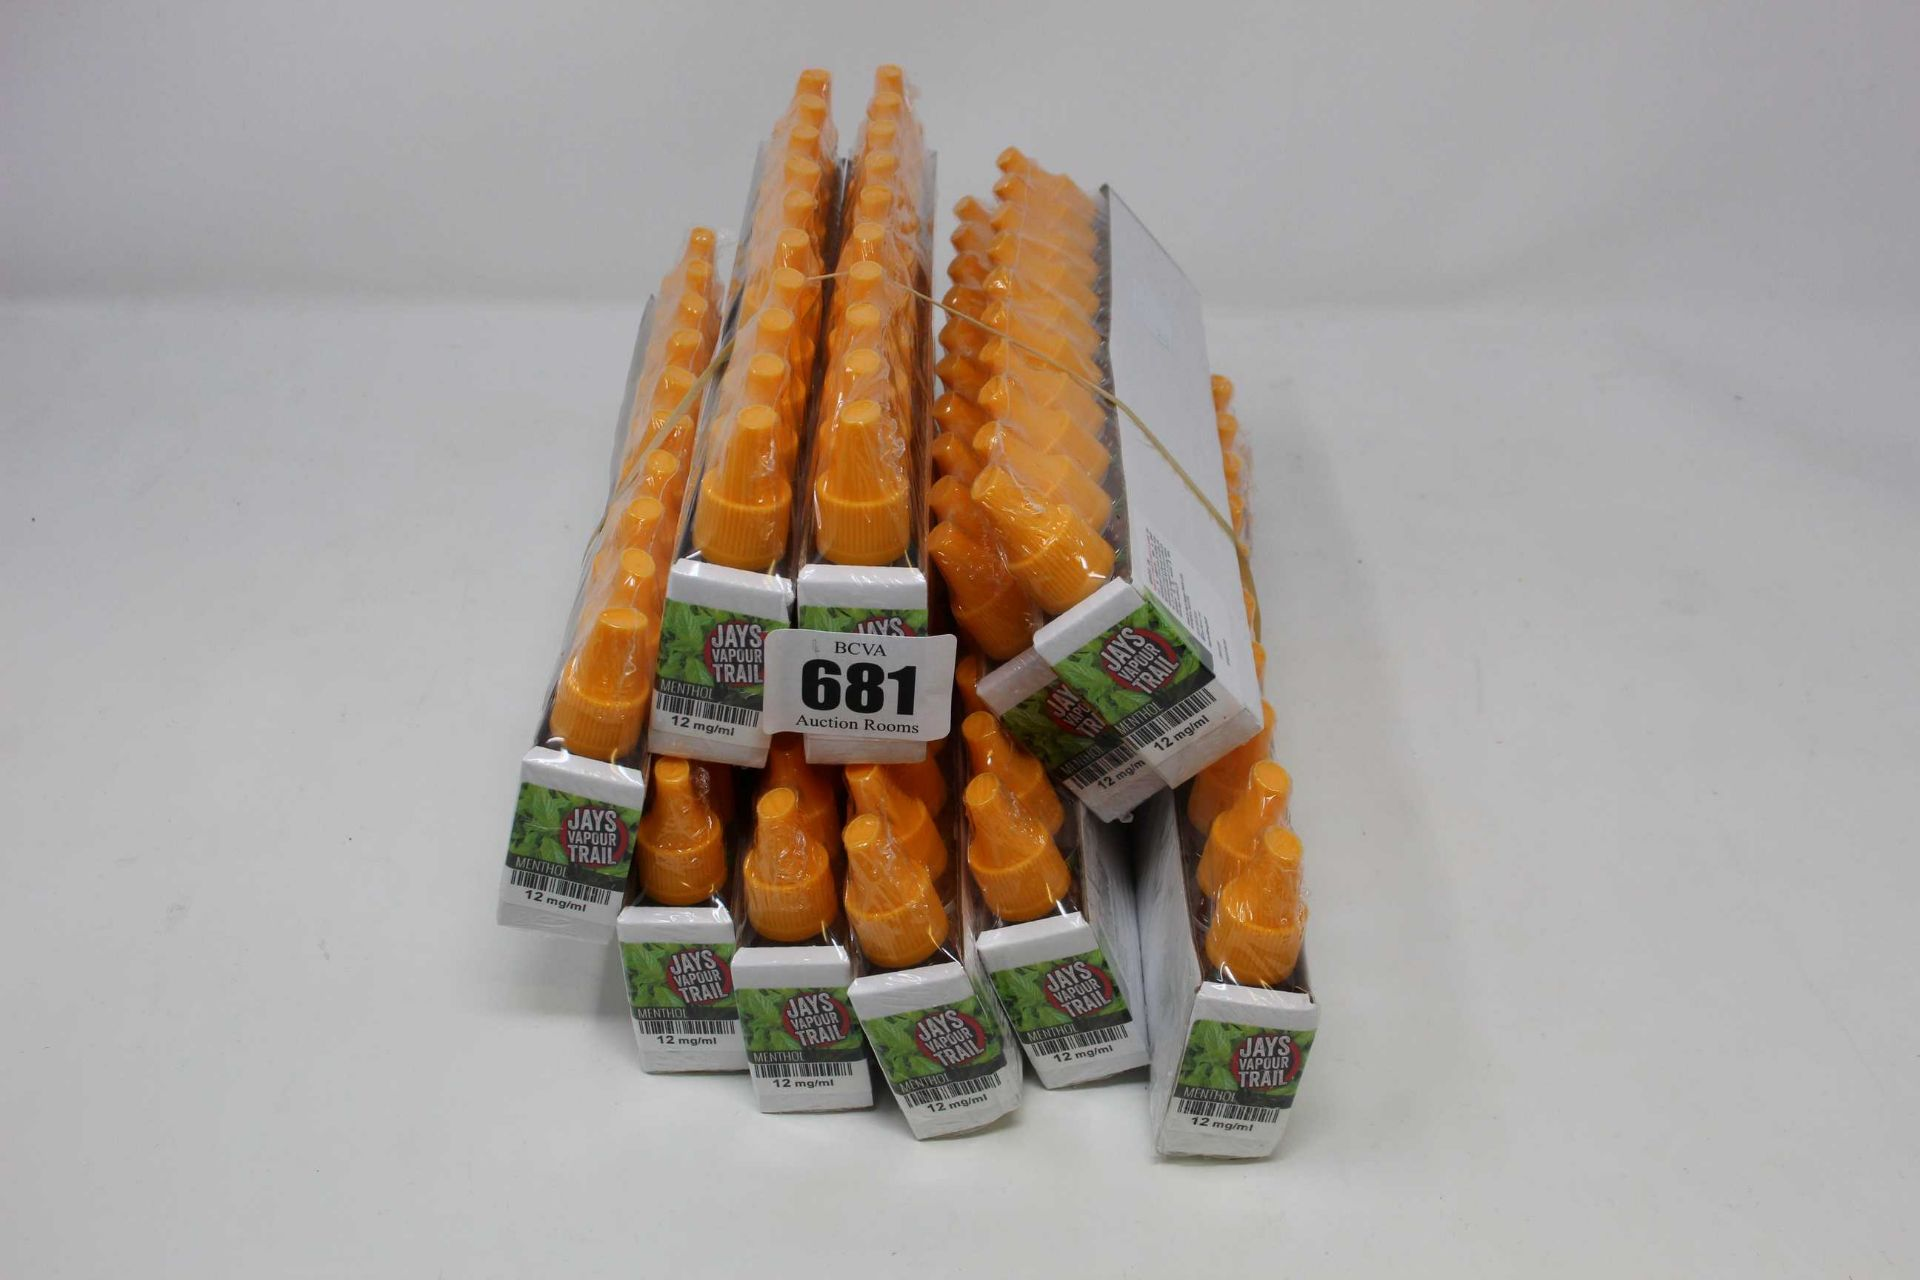 Ten packs of ten 10ml/12mg vape liquid in menthol flavour (Over 18s only).